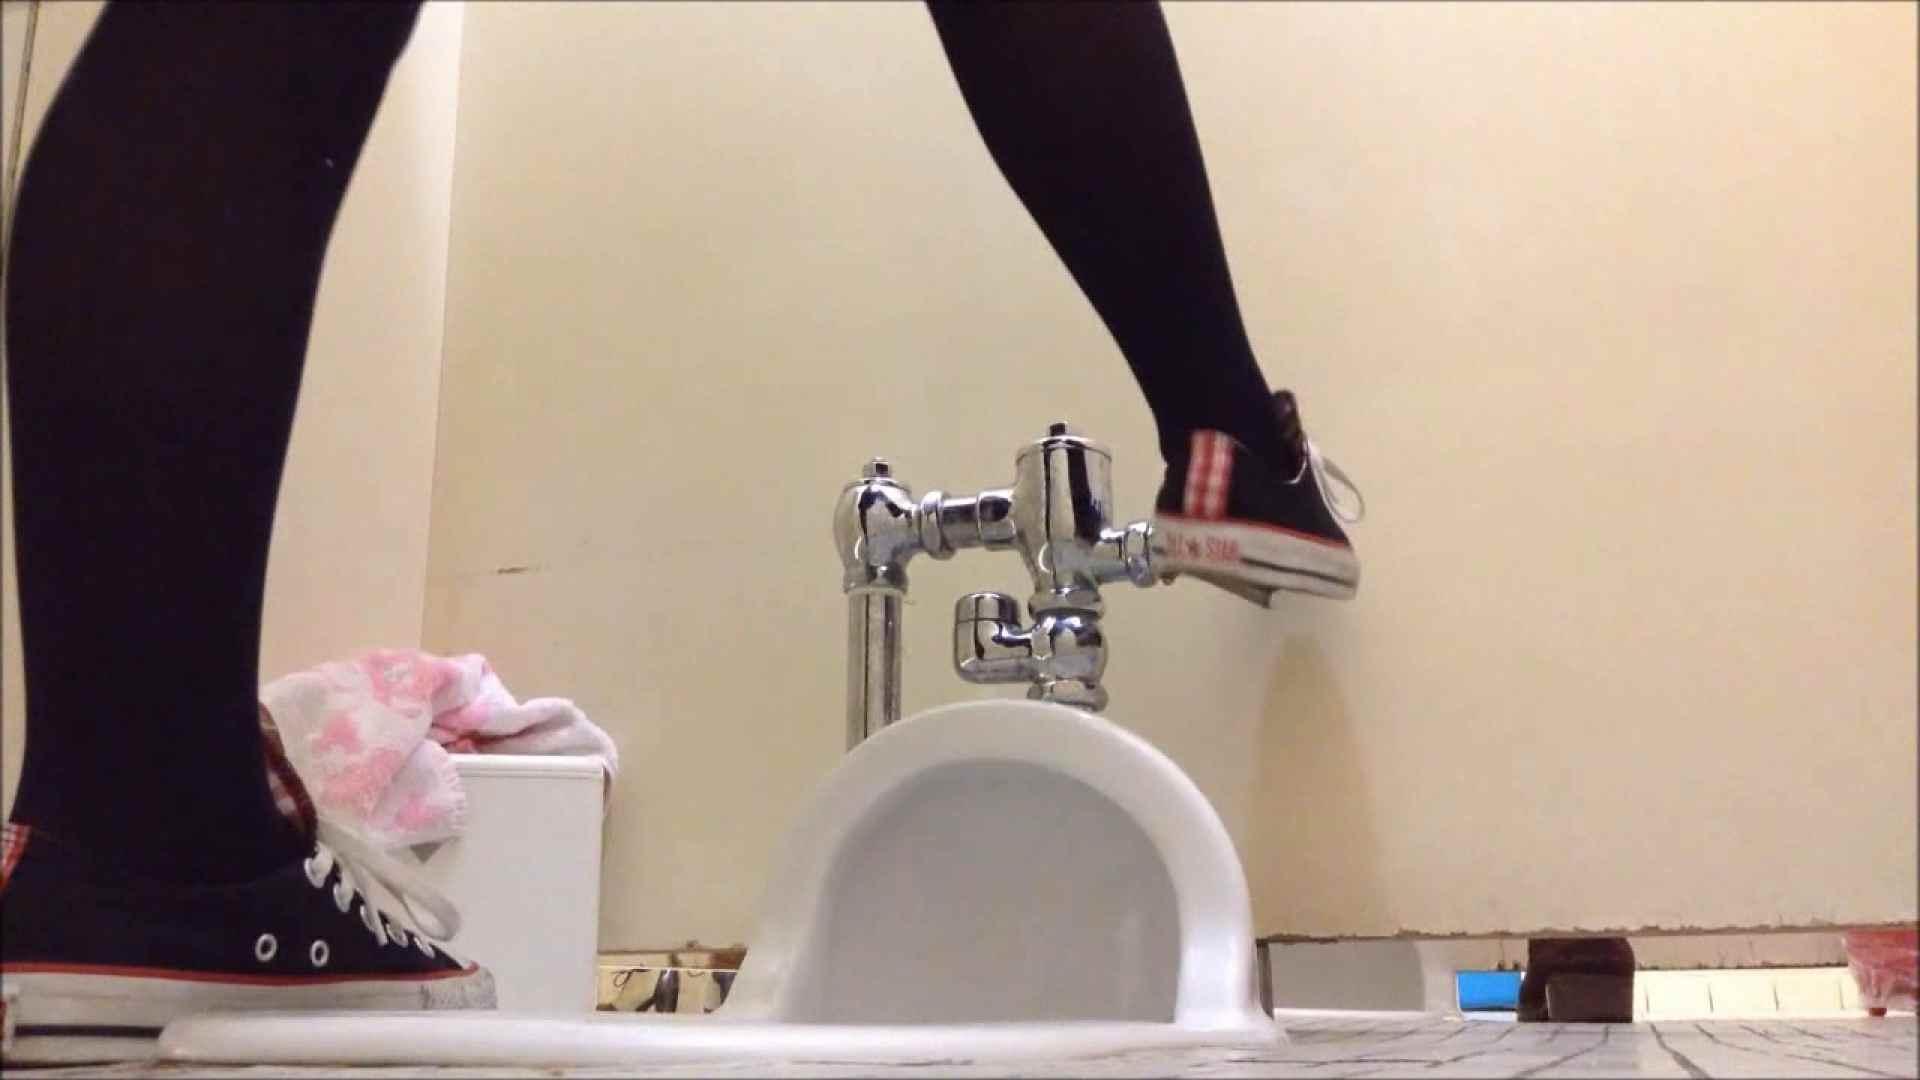 某有名大学女性洗面所 vol.02 洗面所 オメコ動画キャプチャ 67連発 43